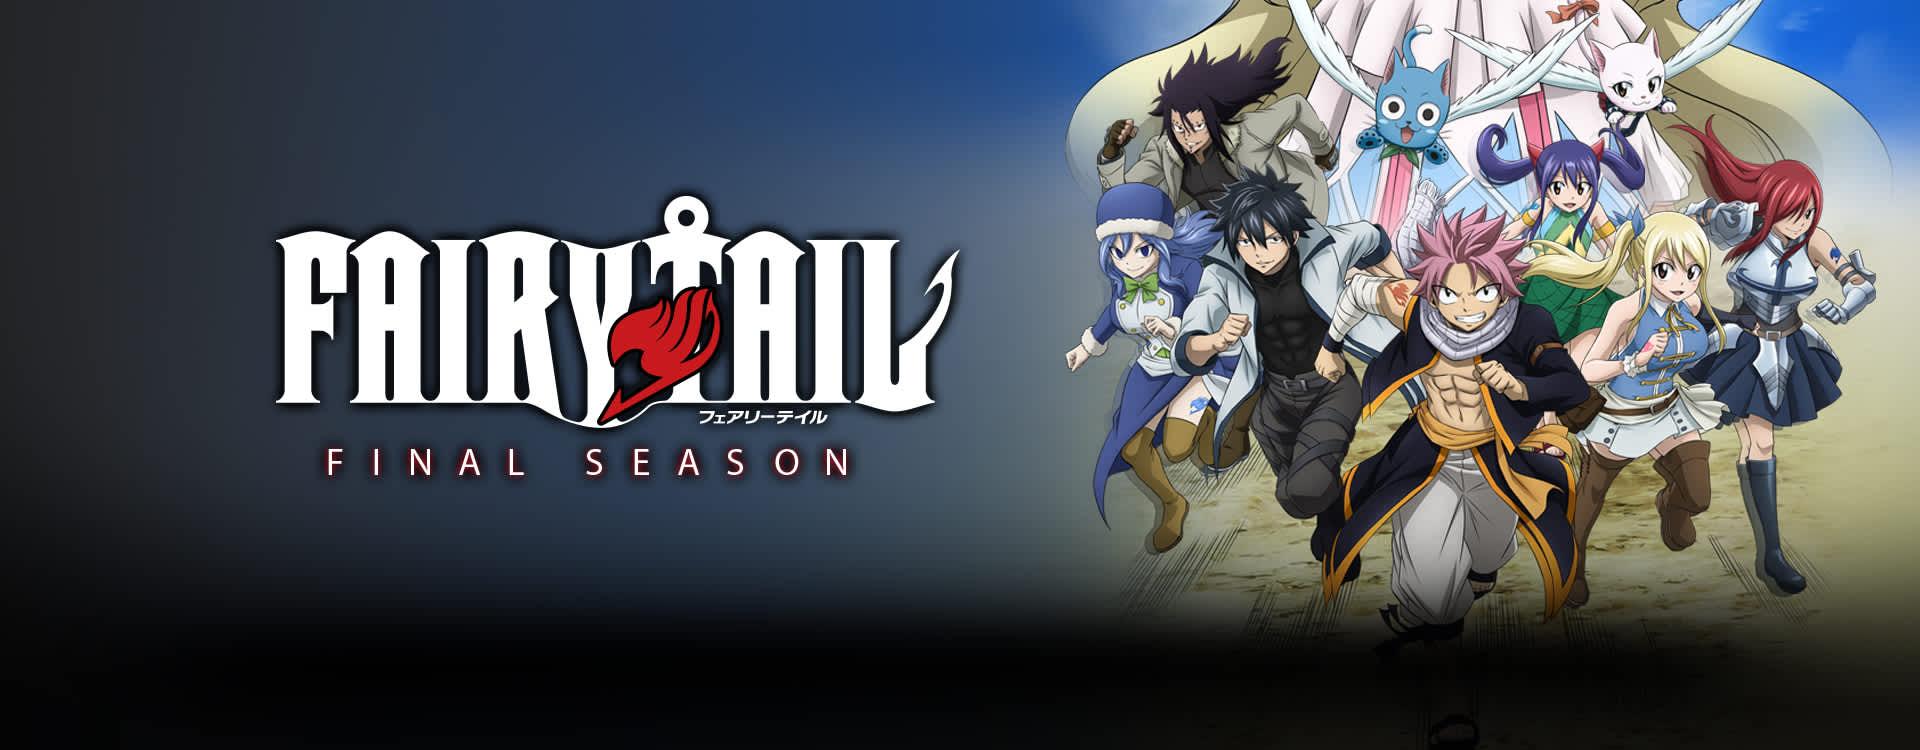 Watch fairy tail episodes sub dub action adventure fantasy shounen anime funimation